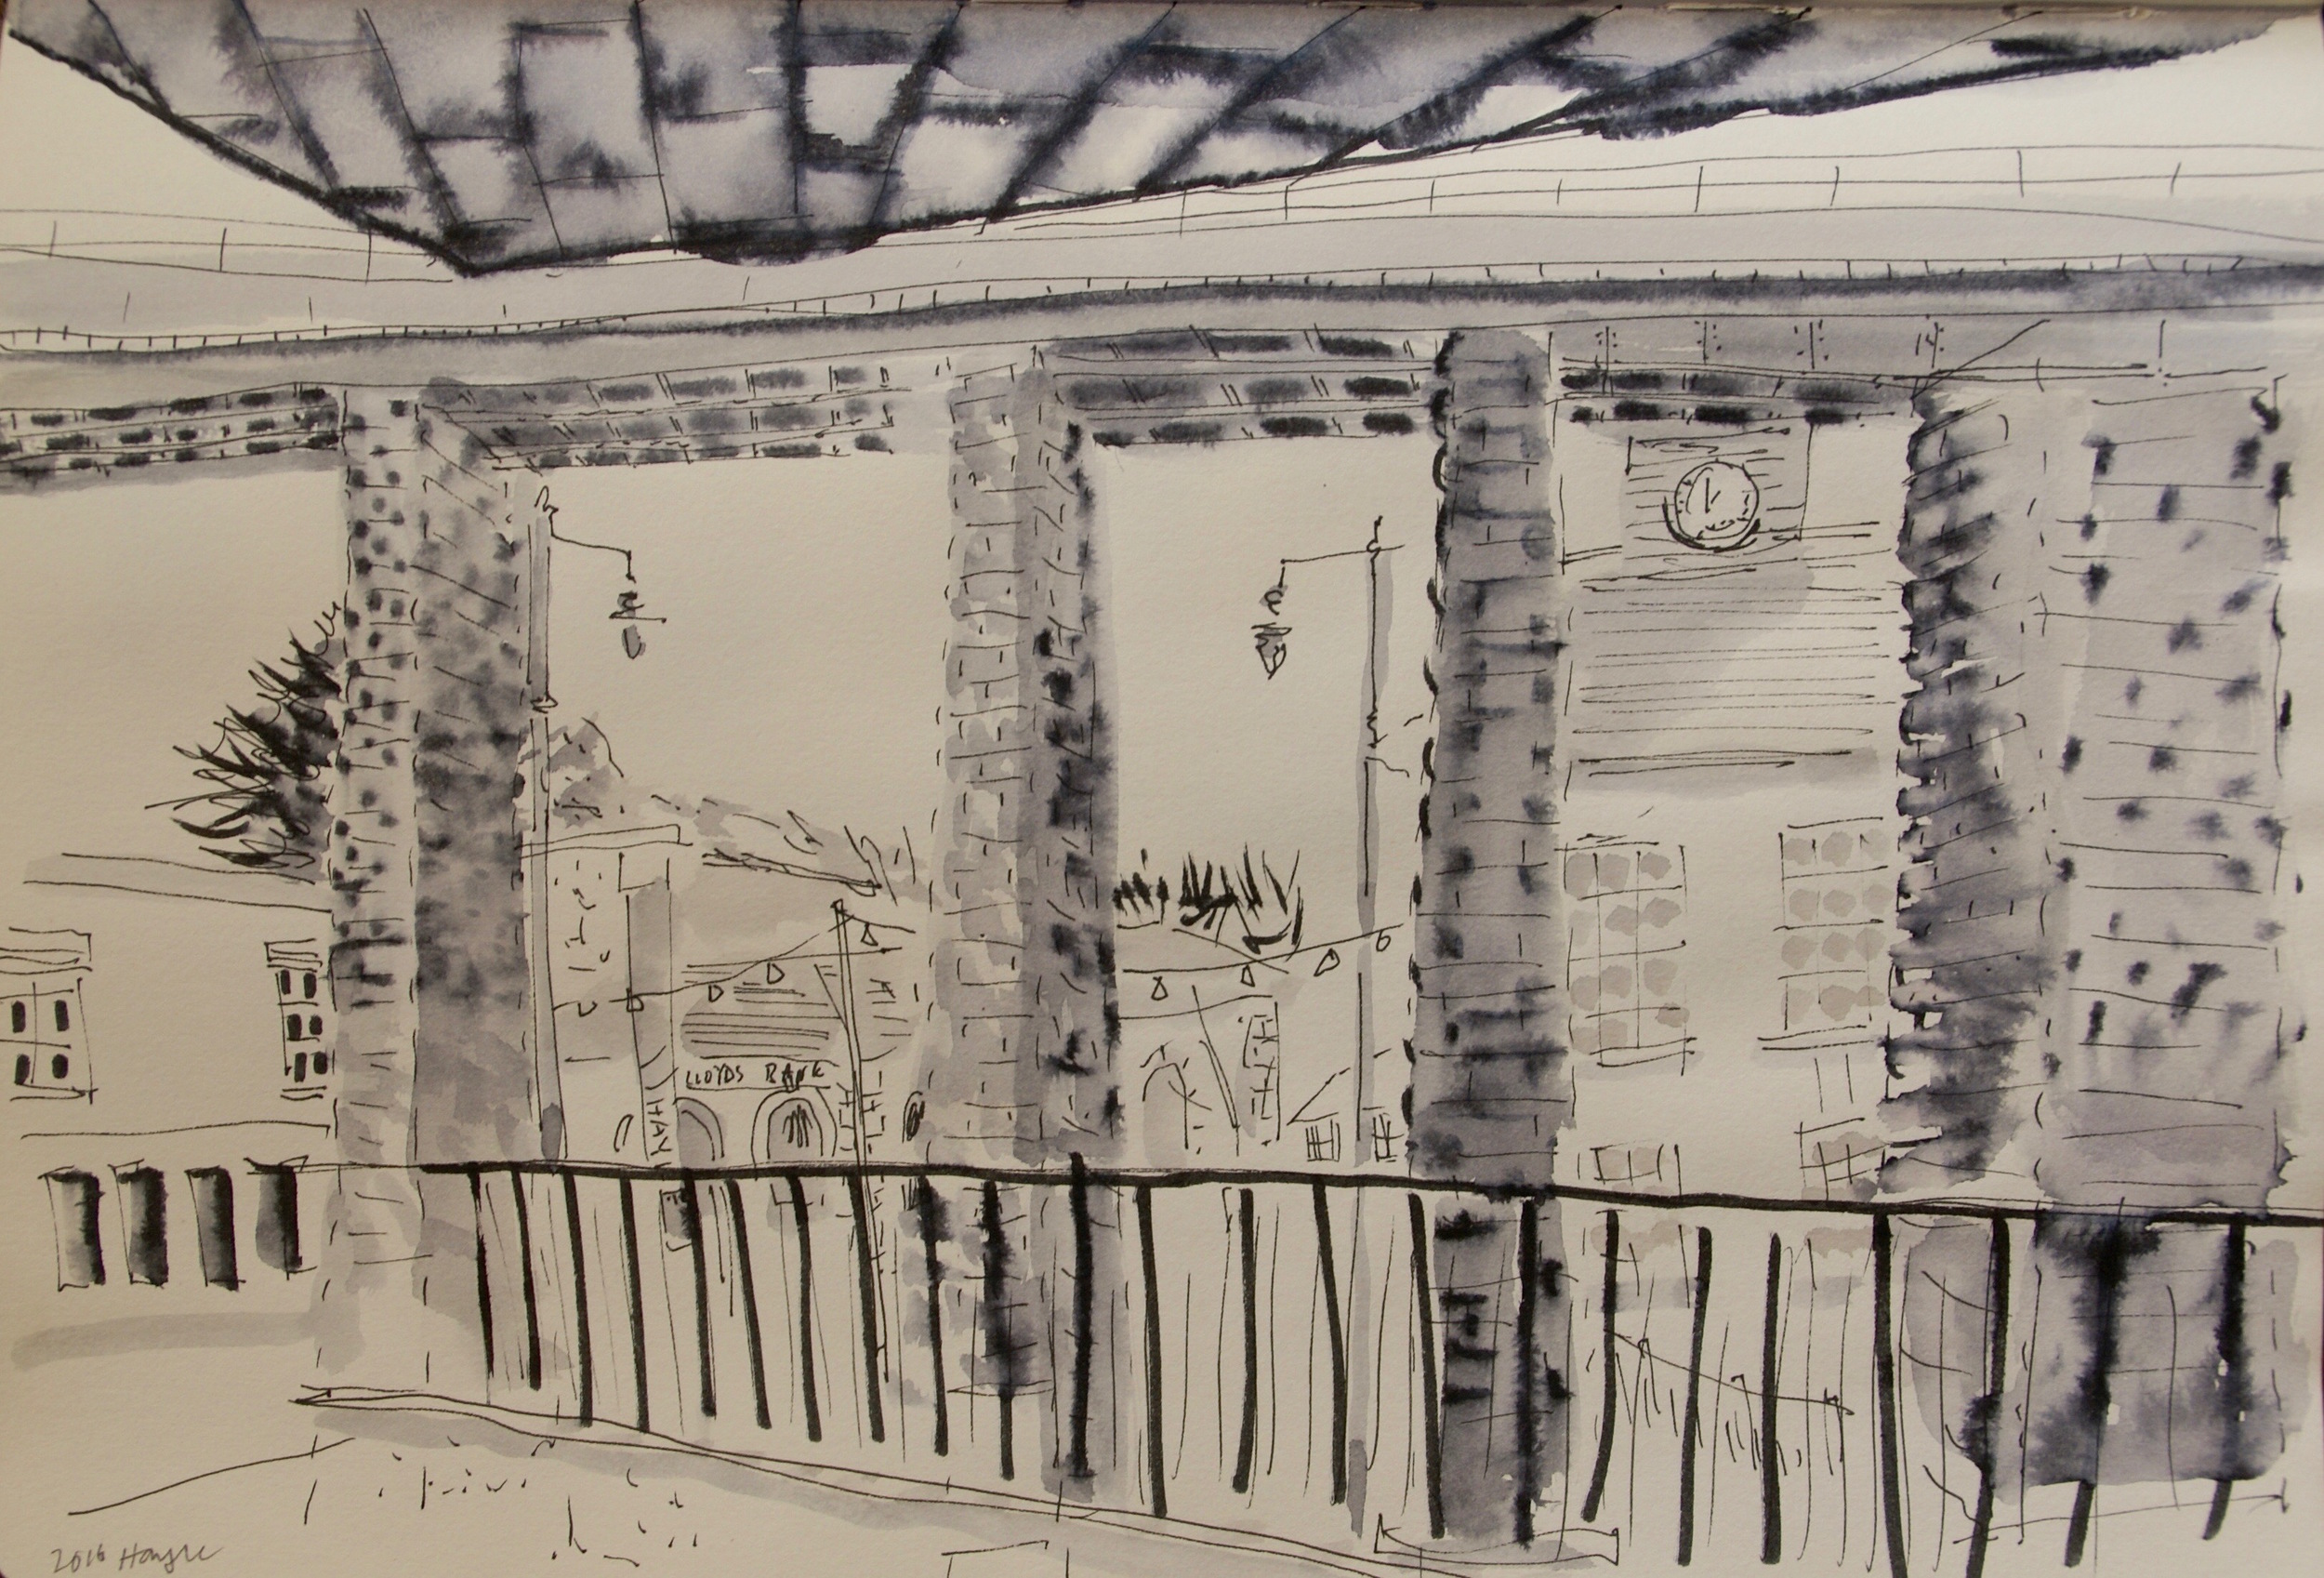 Hayle Viaduct